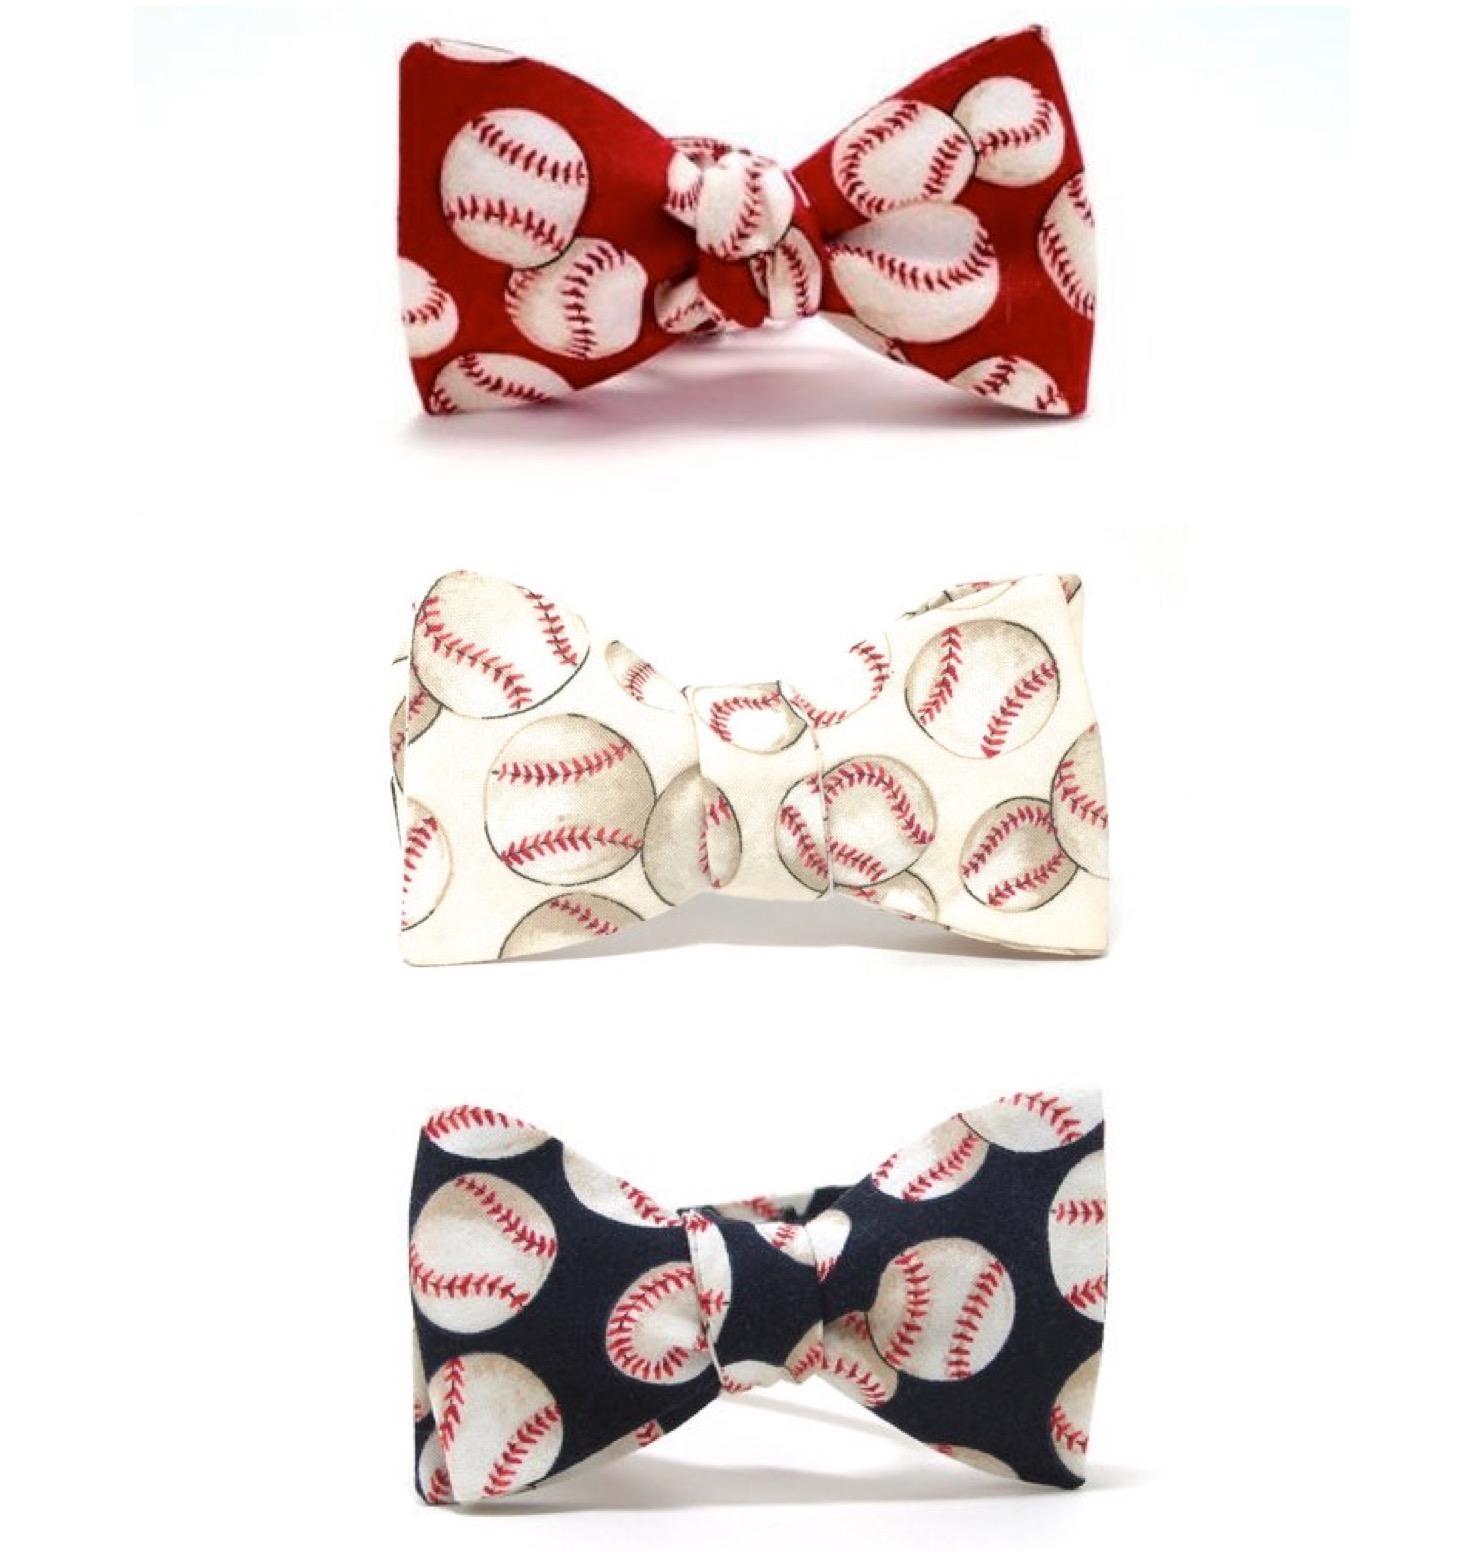 Photo of the Triple Play baseball bow tie bundle